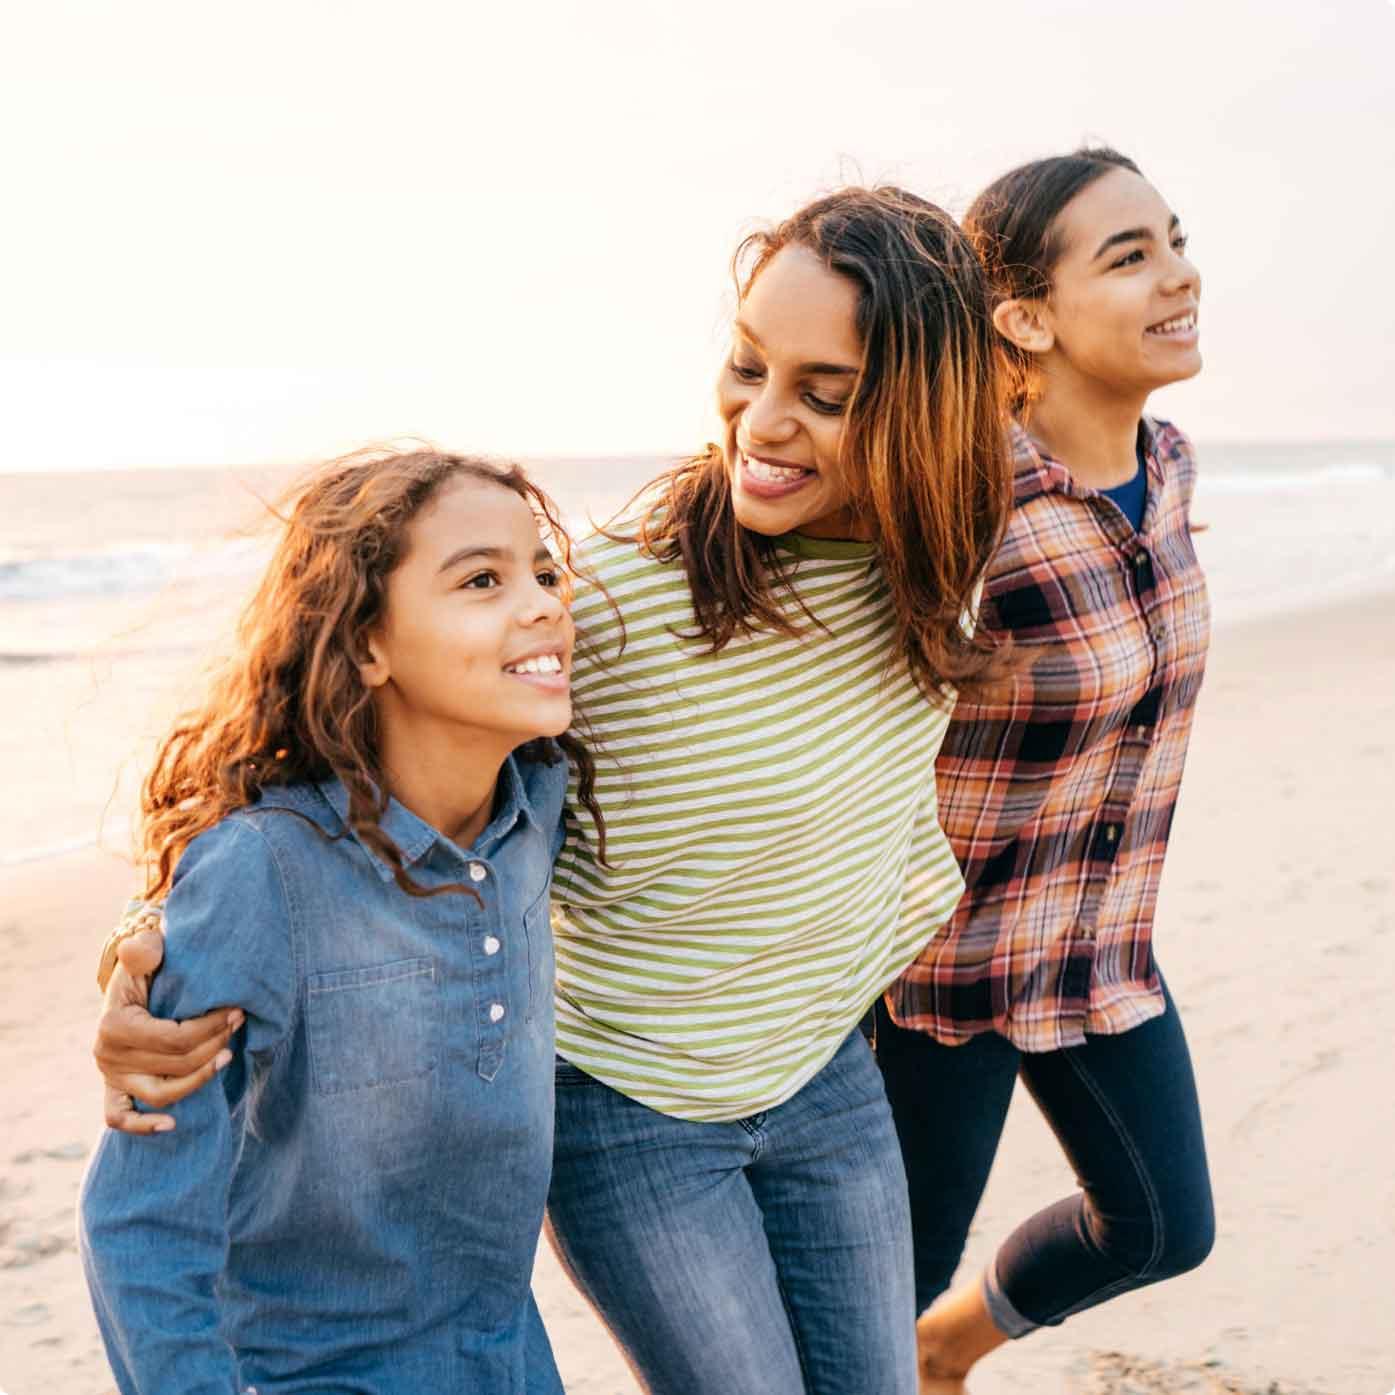 Three happy female friends strolling on the beach